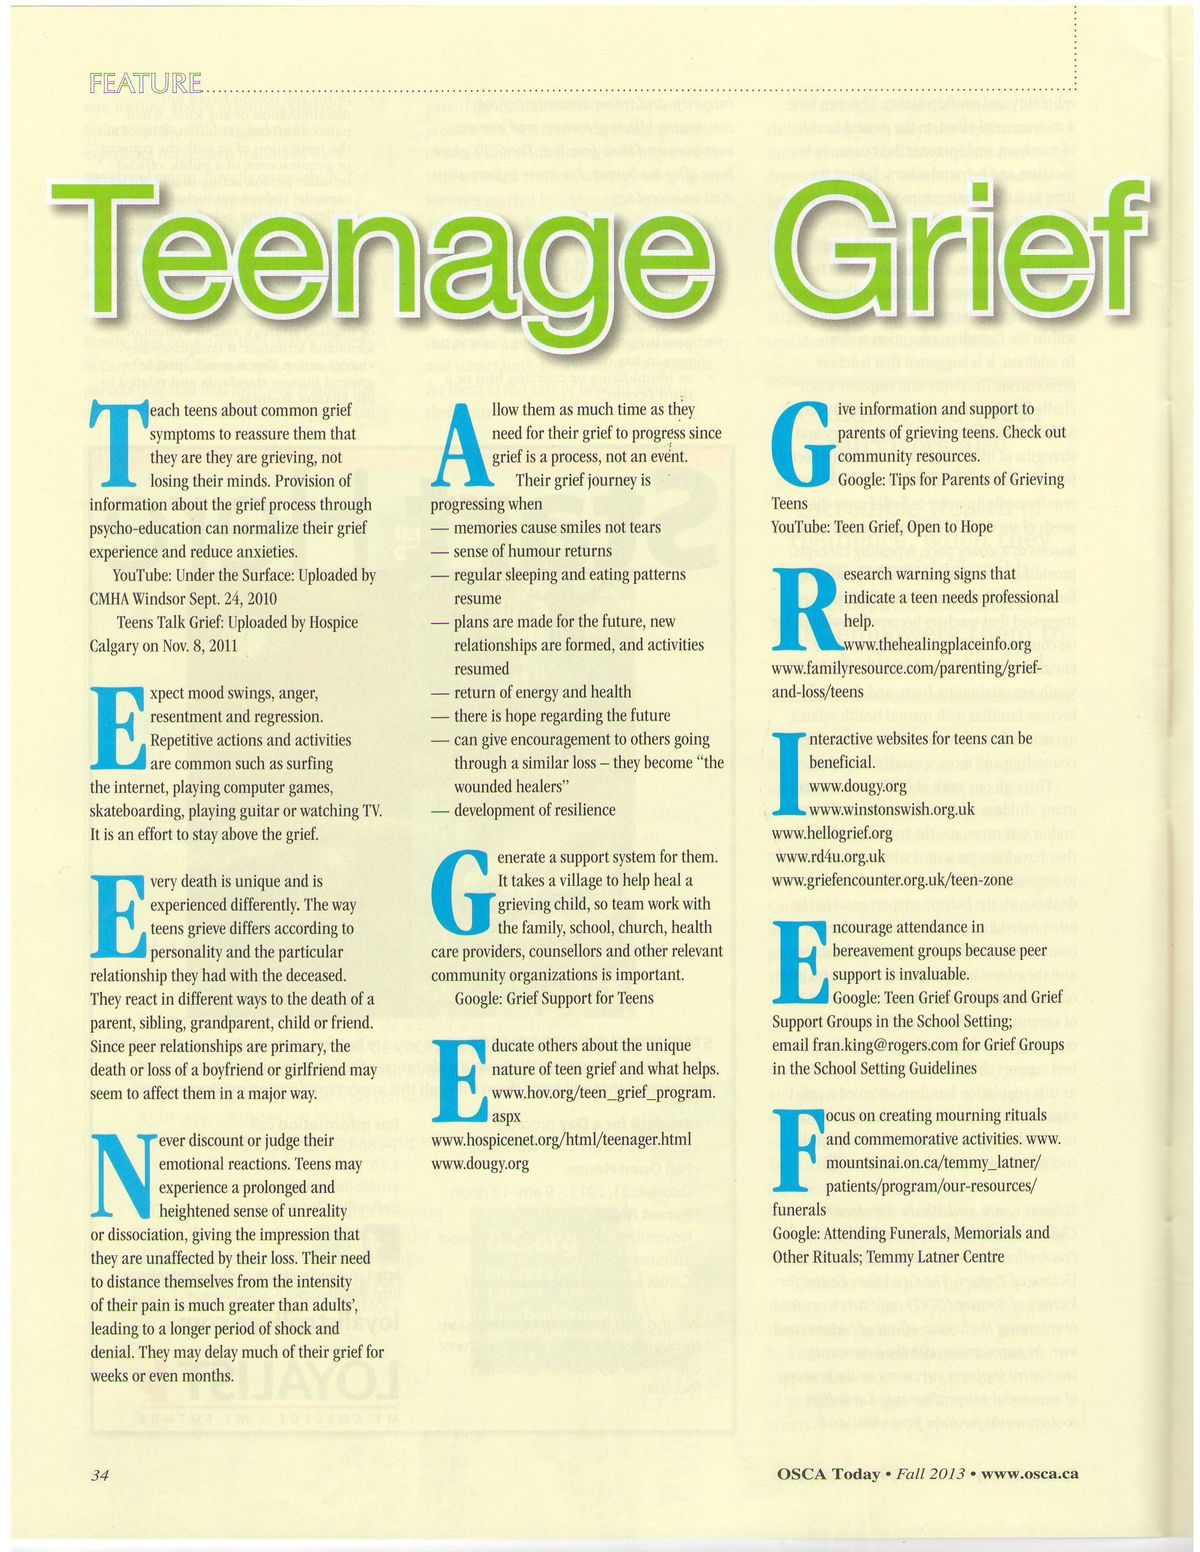 Teenage Grief